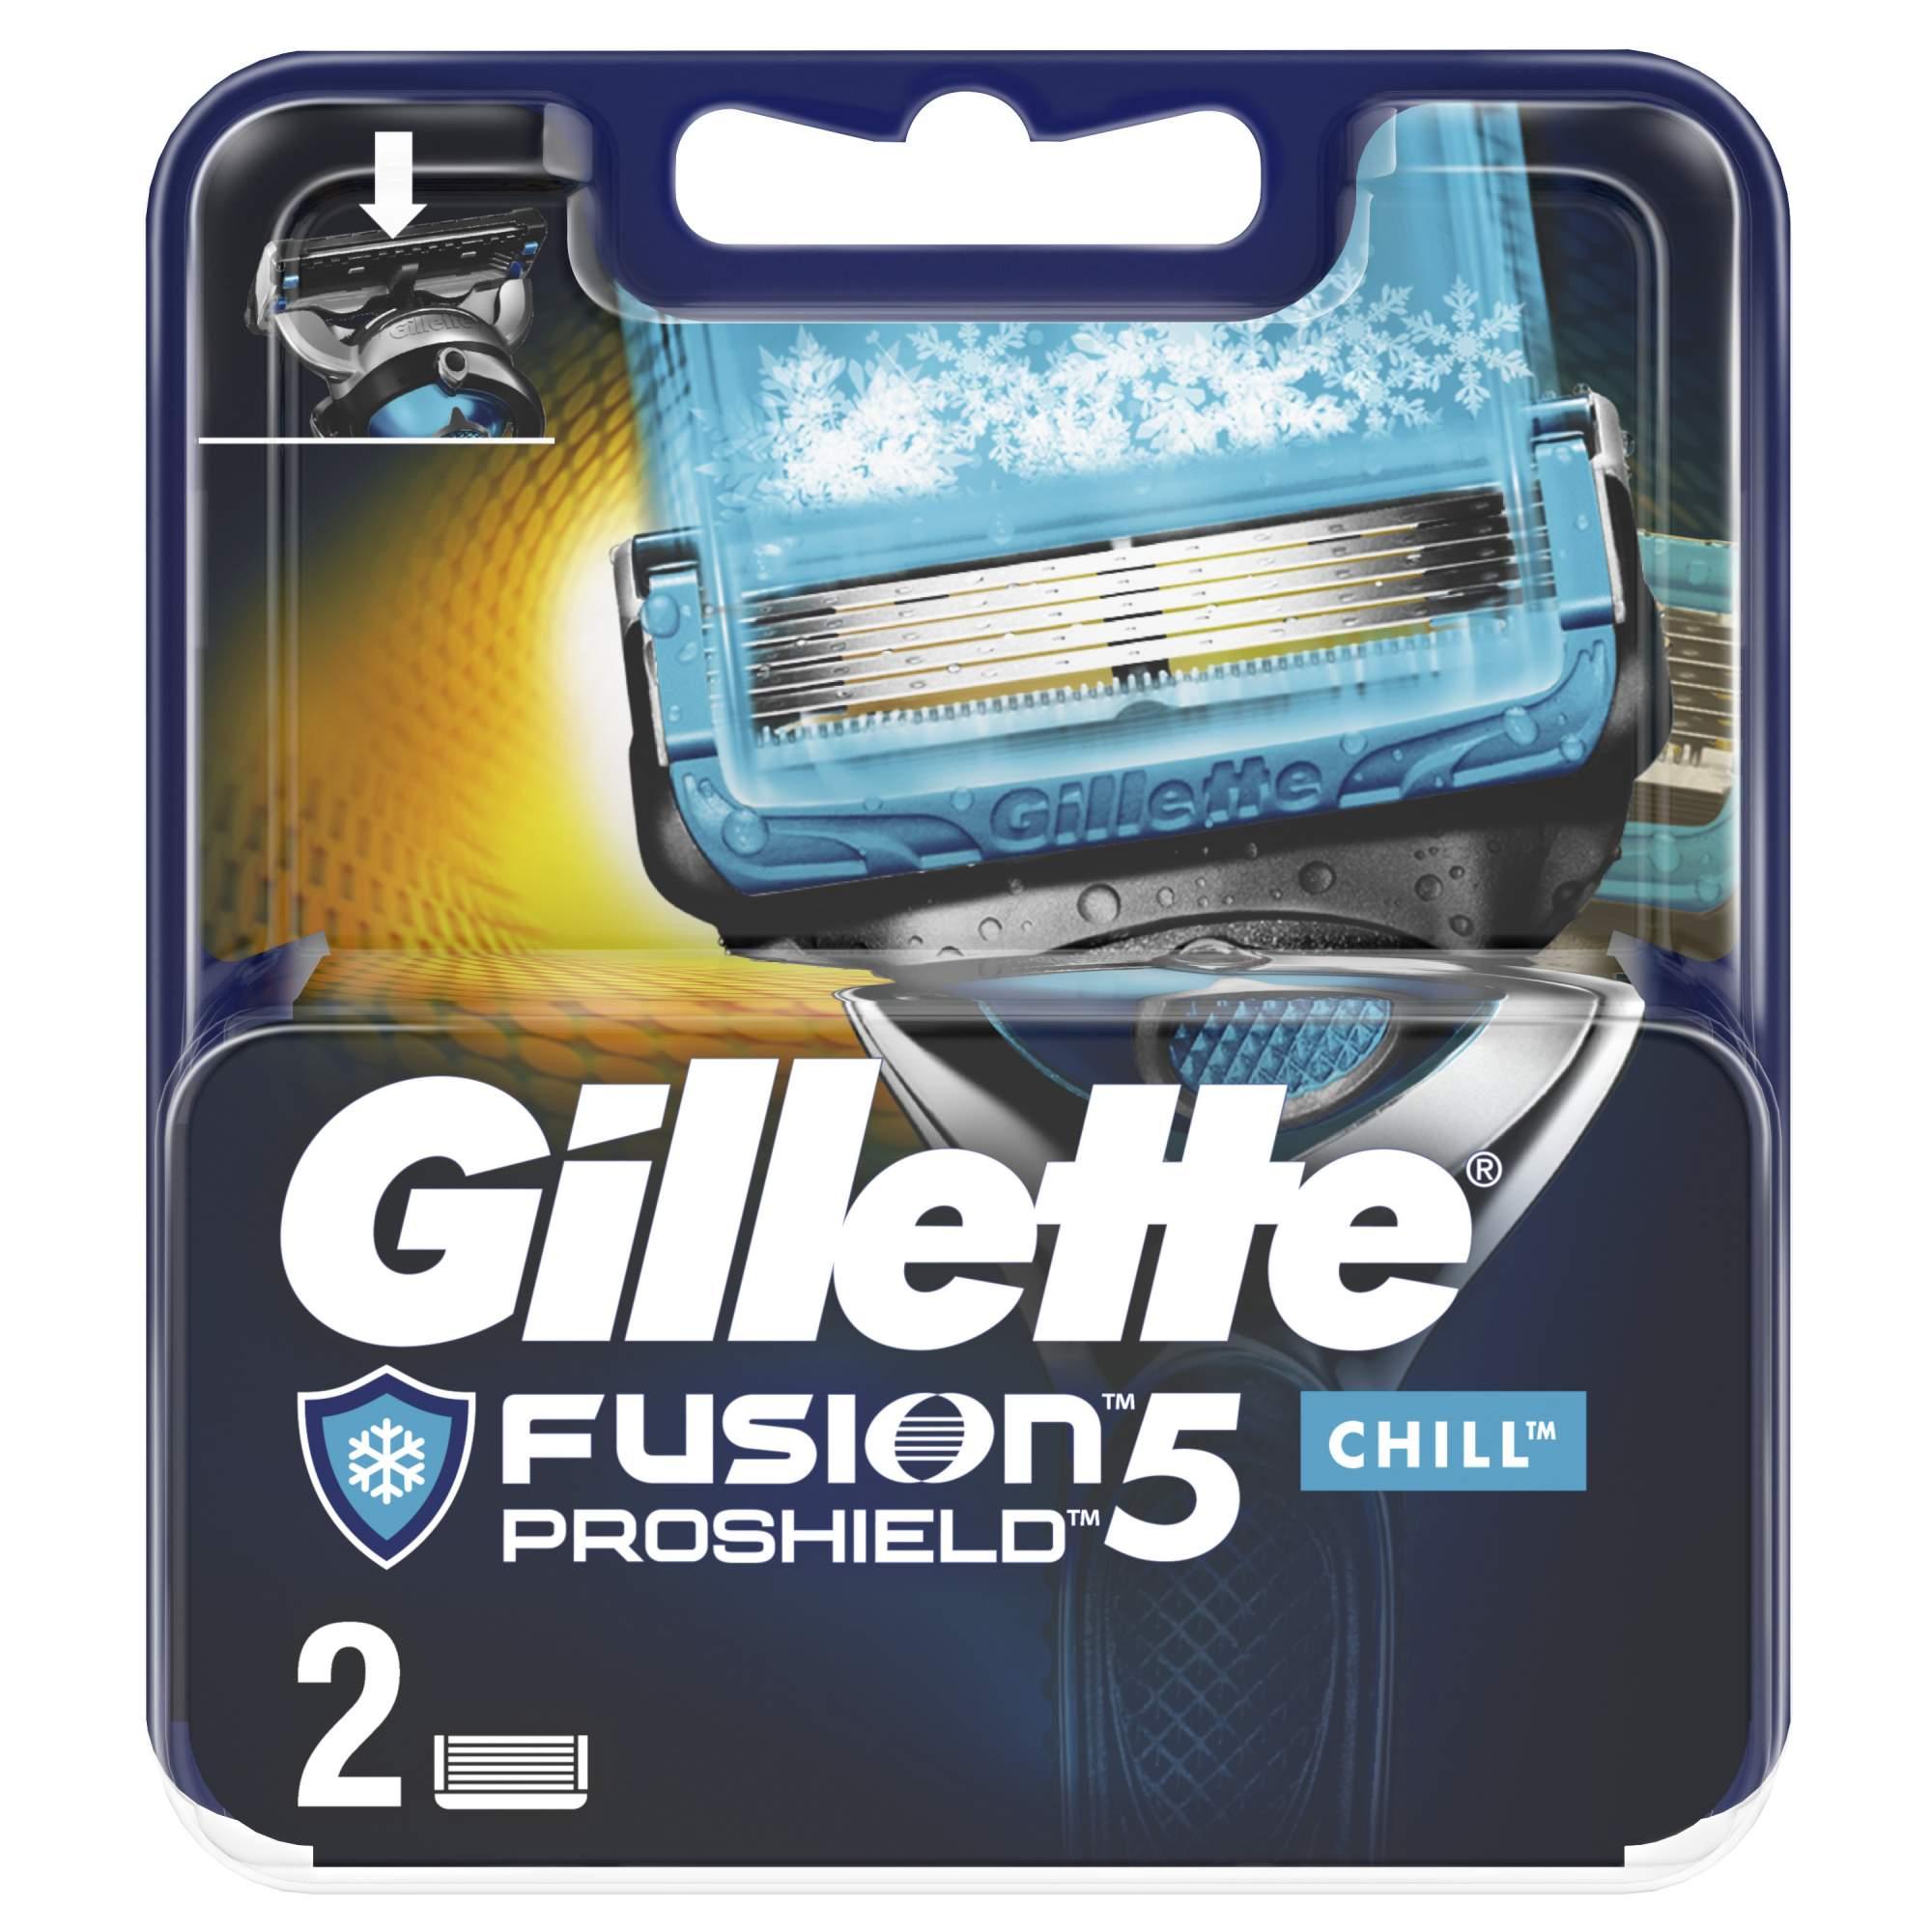 Сменные кассеты Gillette Fusion5 ProShield Chill 2 шт